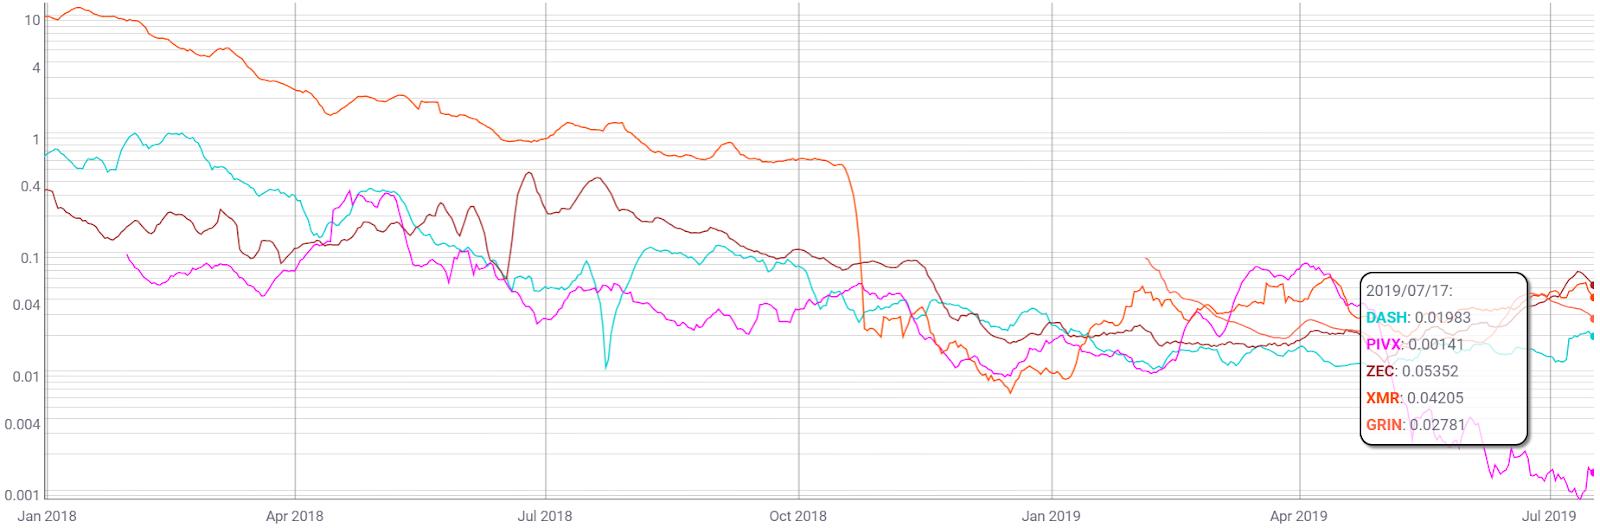 Monero Price Analysis - XMR bug shakes users » Brave New Coin